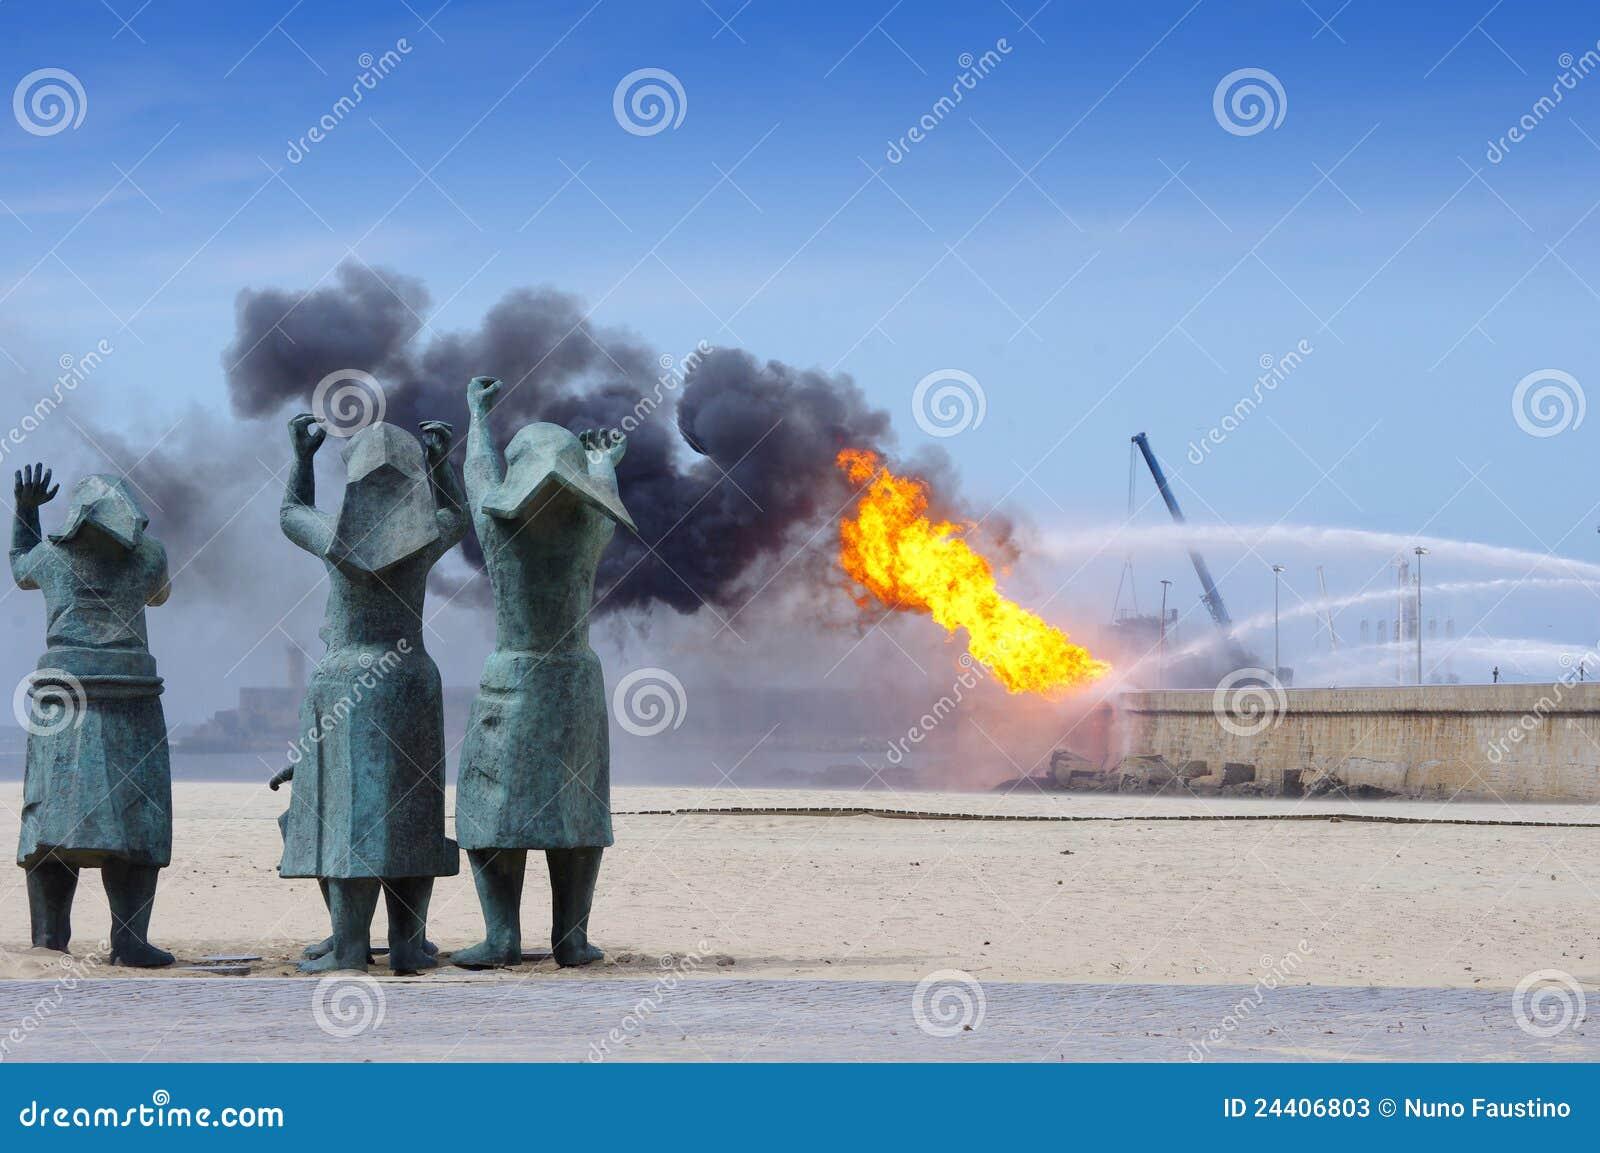 Explosion in oil refinery